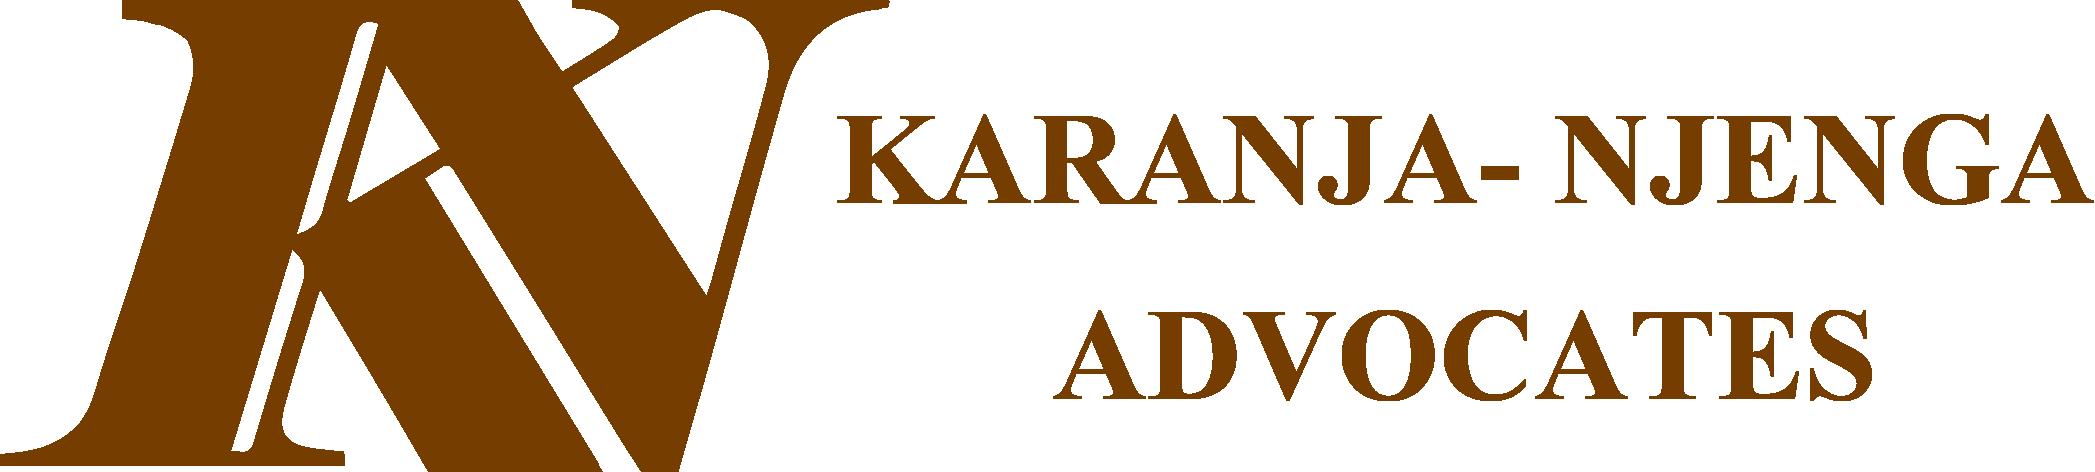 Karanja Njenga Advocates